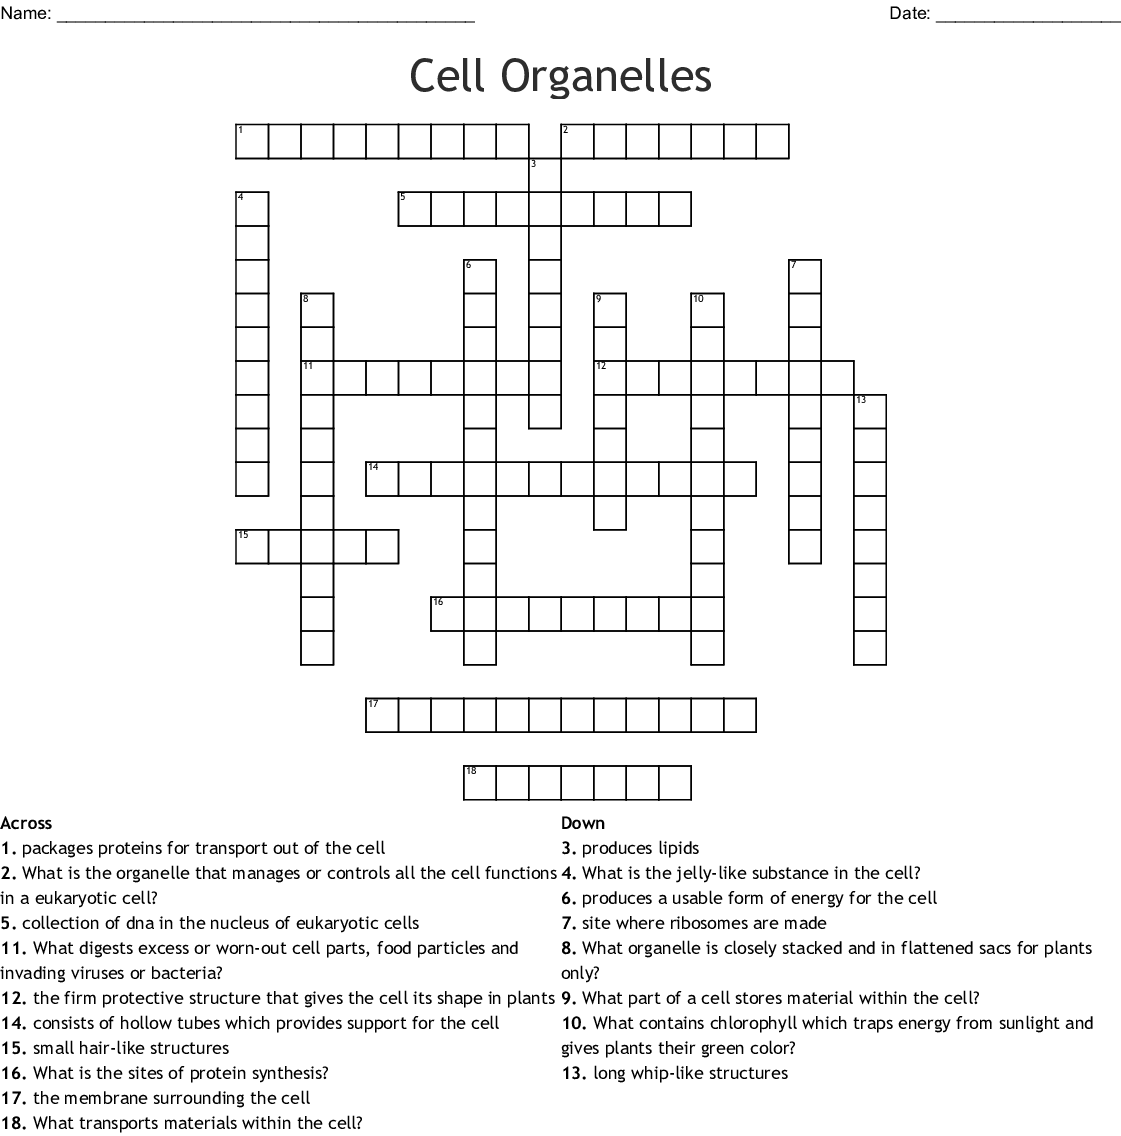 Cell Organelles Crossword - WordMint